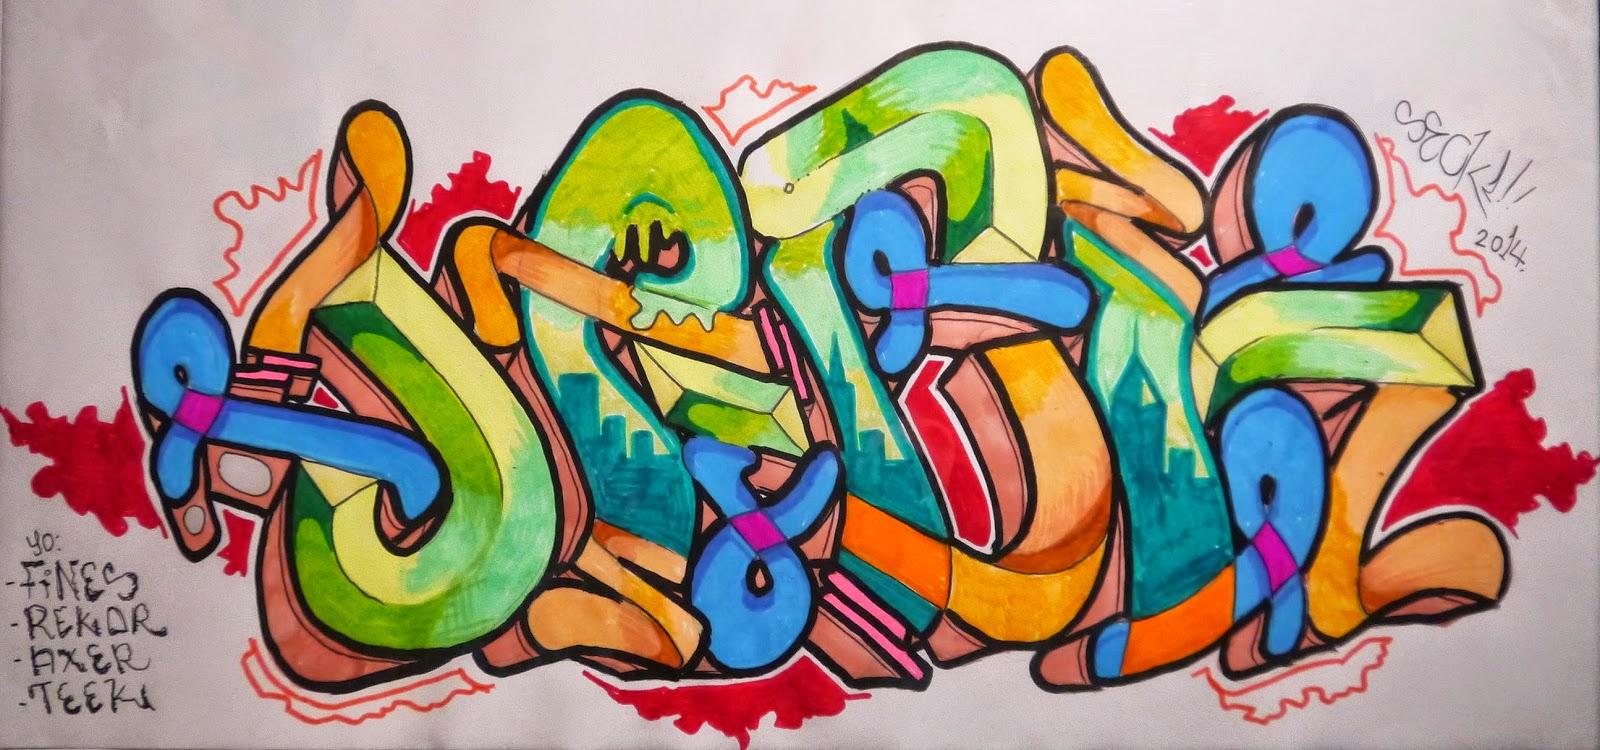 Graffiti Blackbook Sketch Unexpected Gift